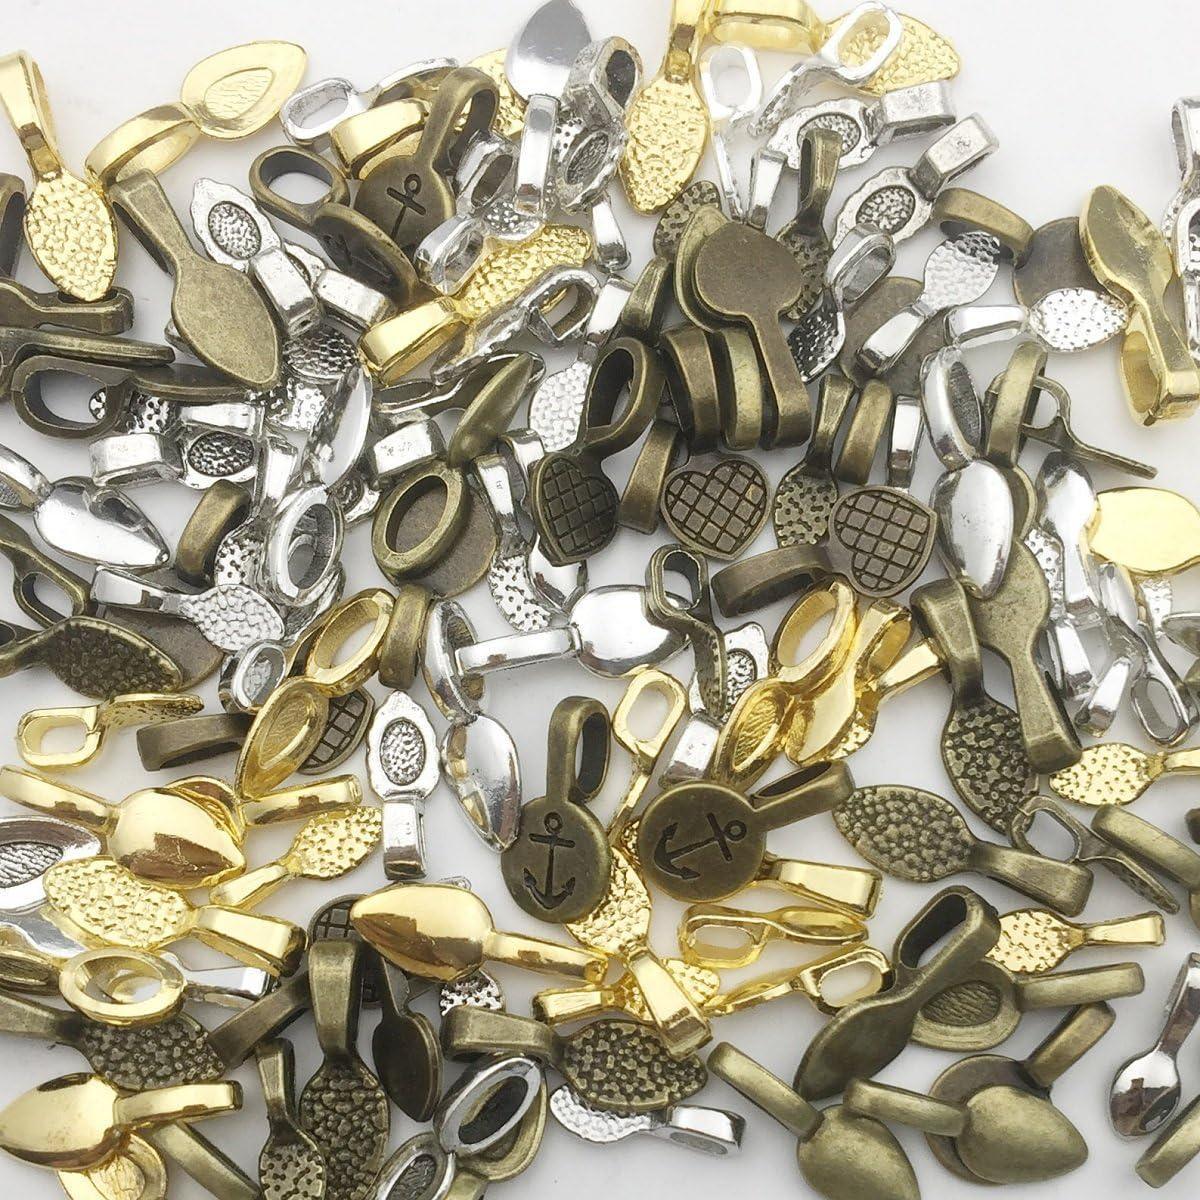 Hang Bails Pendant Bails Antiqued Silver Bails Blank Bails Jewelry Bails Findings Charm Hangers Pendant Hangers 10 pieces